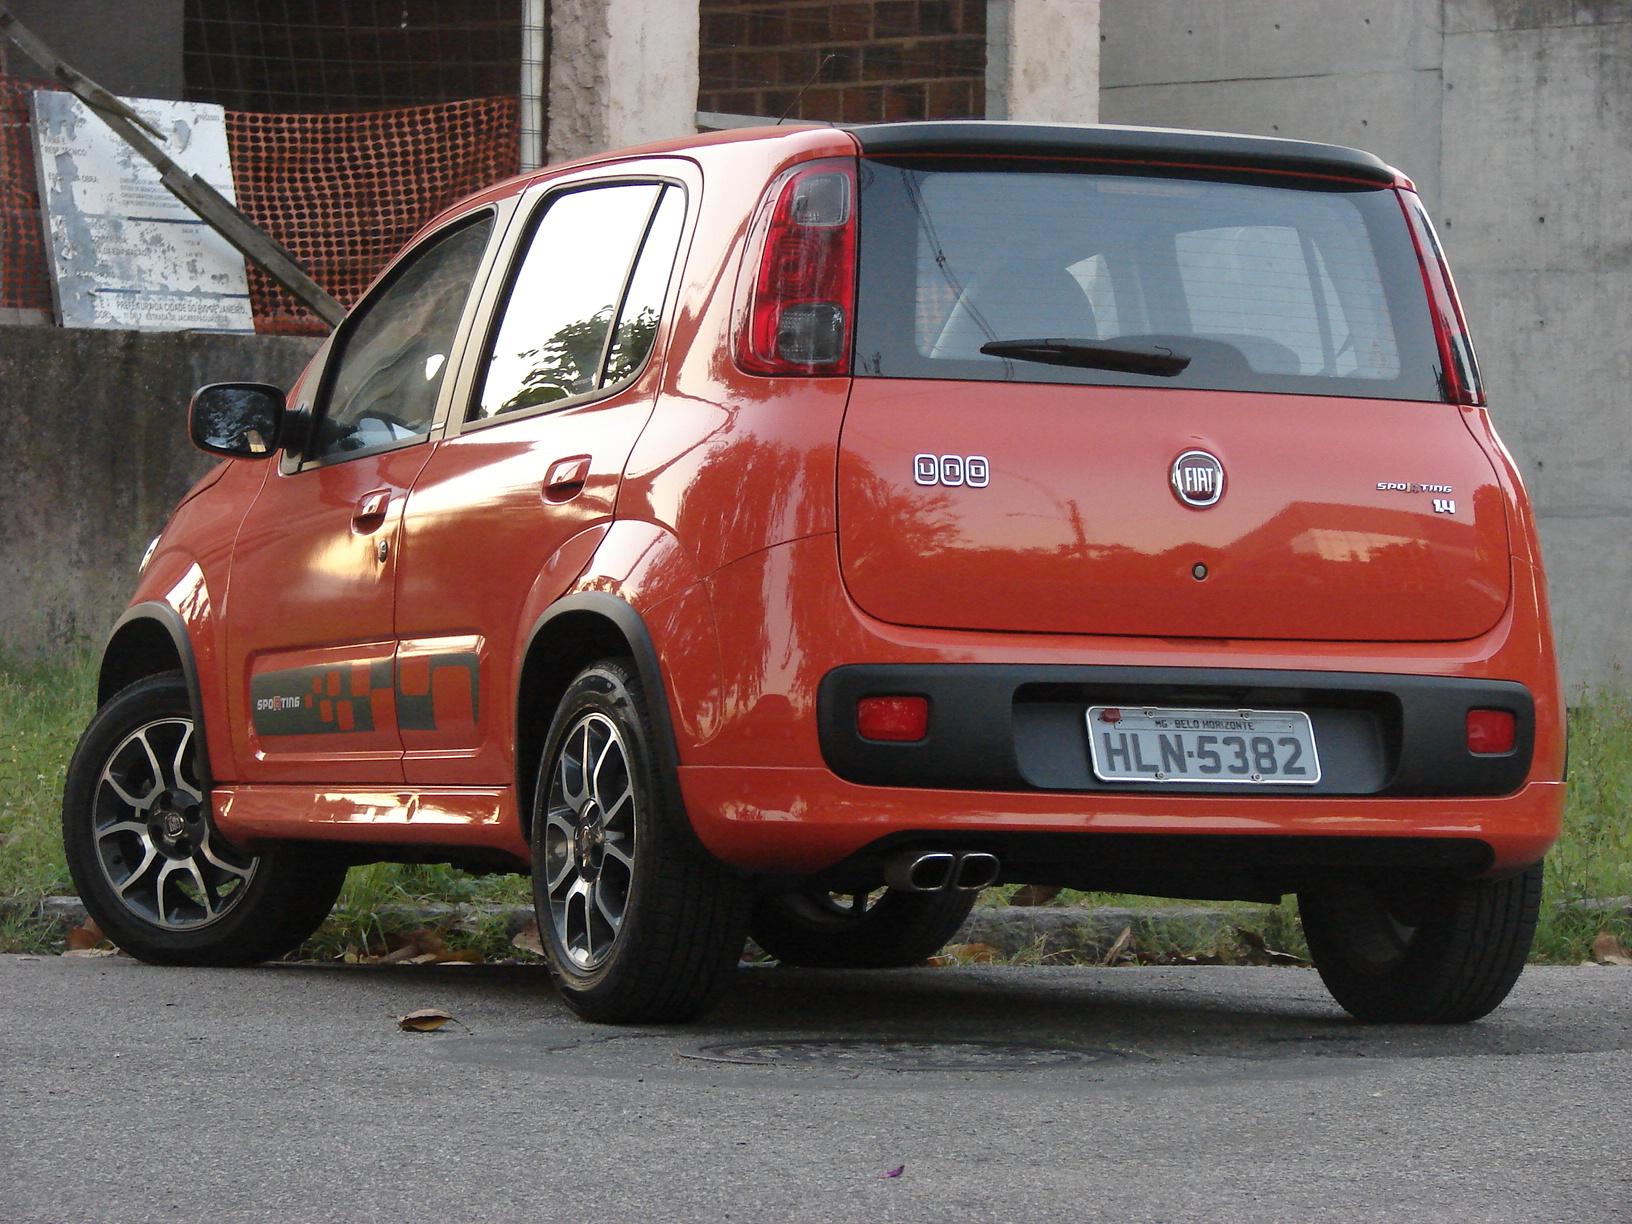 Avaliacao Fiat Uno Sporting 1 4 8v Flex 4p 2011 Carpoint News